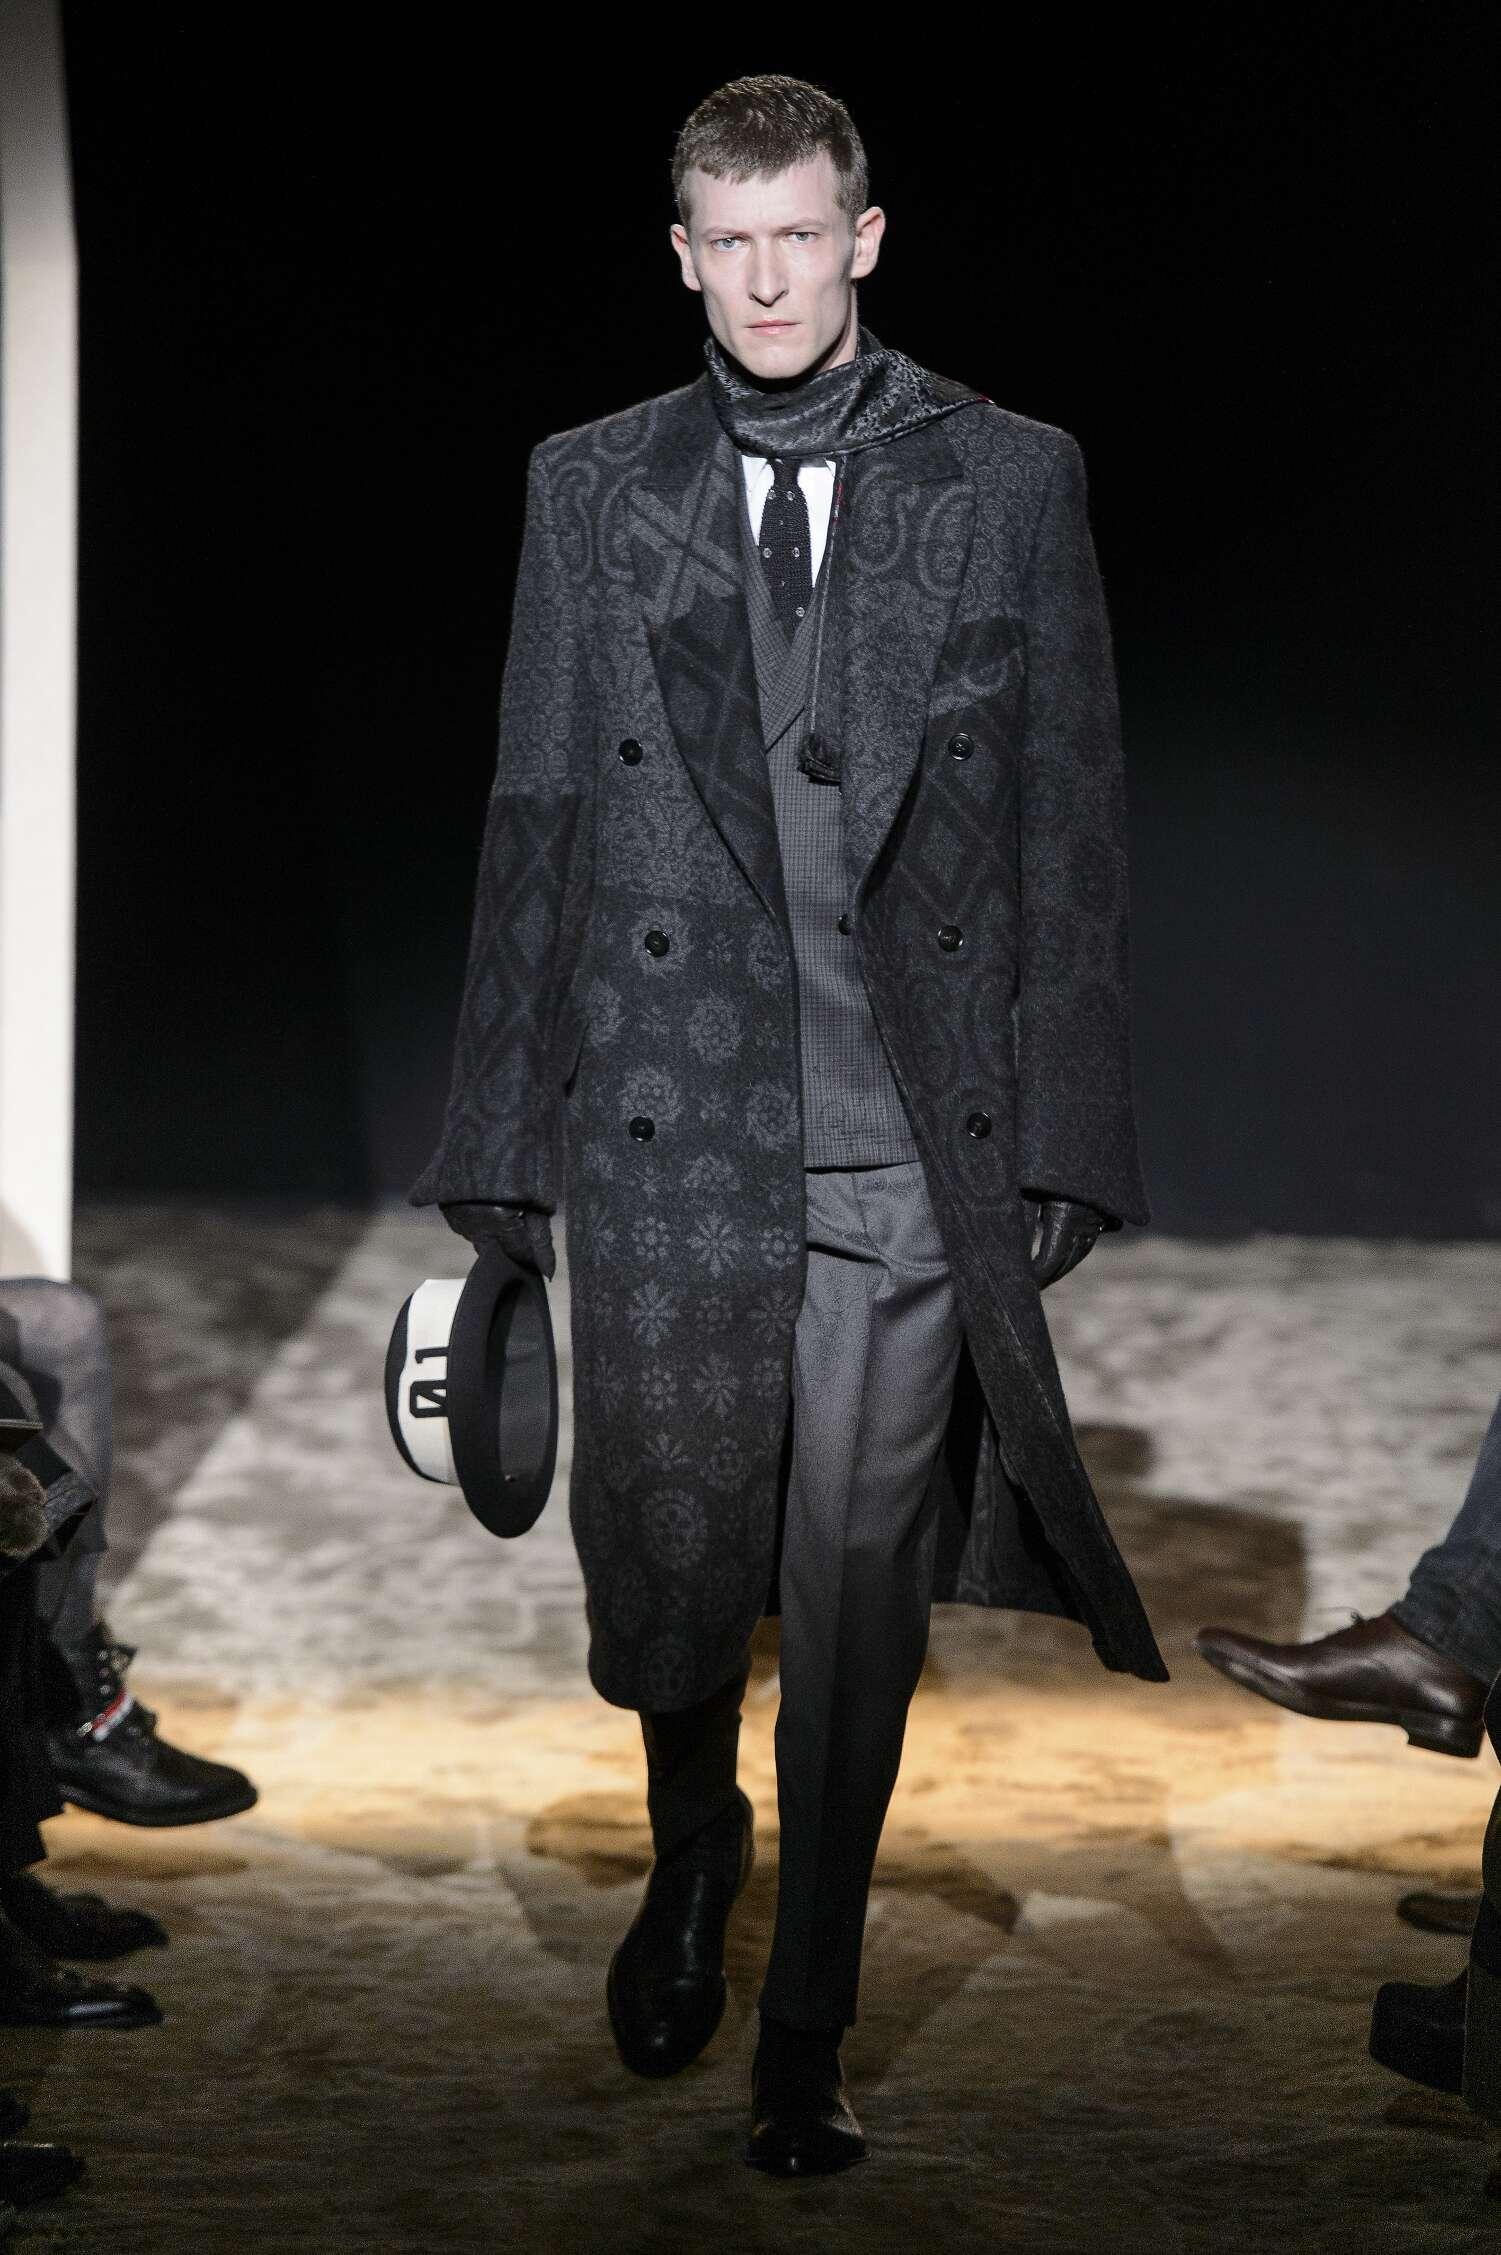 Ermenegildo Zegna Couture Fashion Show FW 2016 17